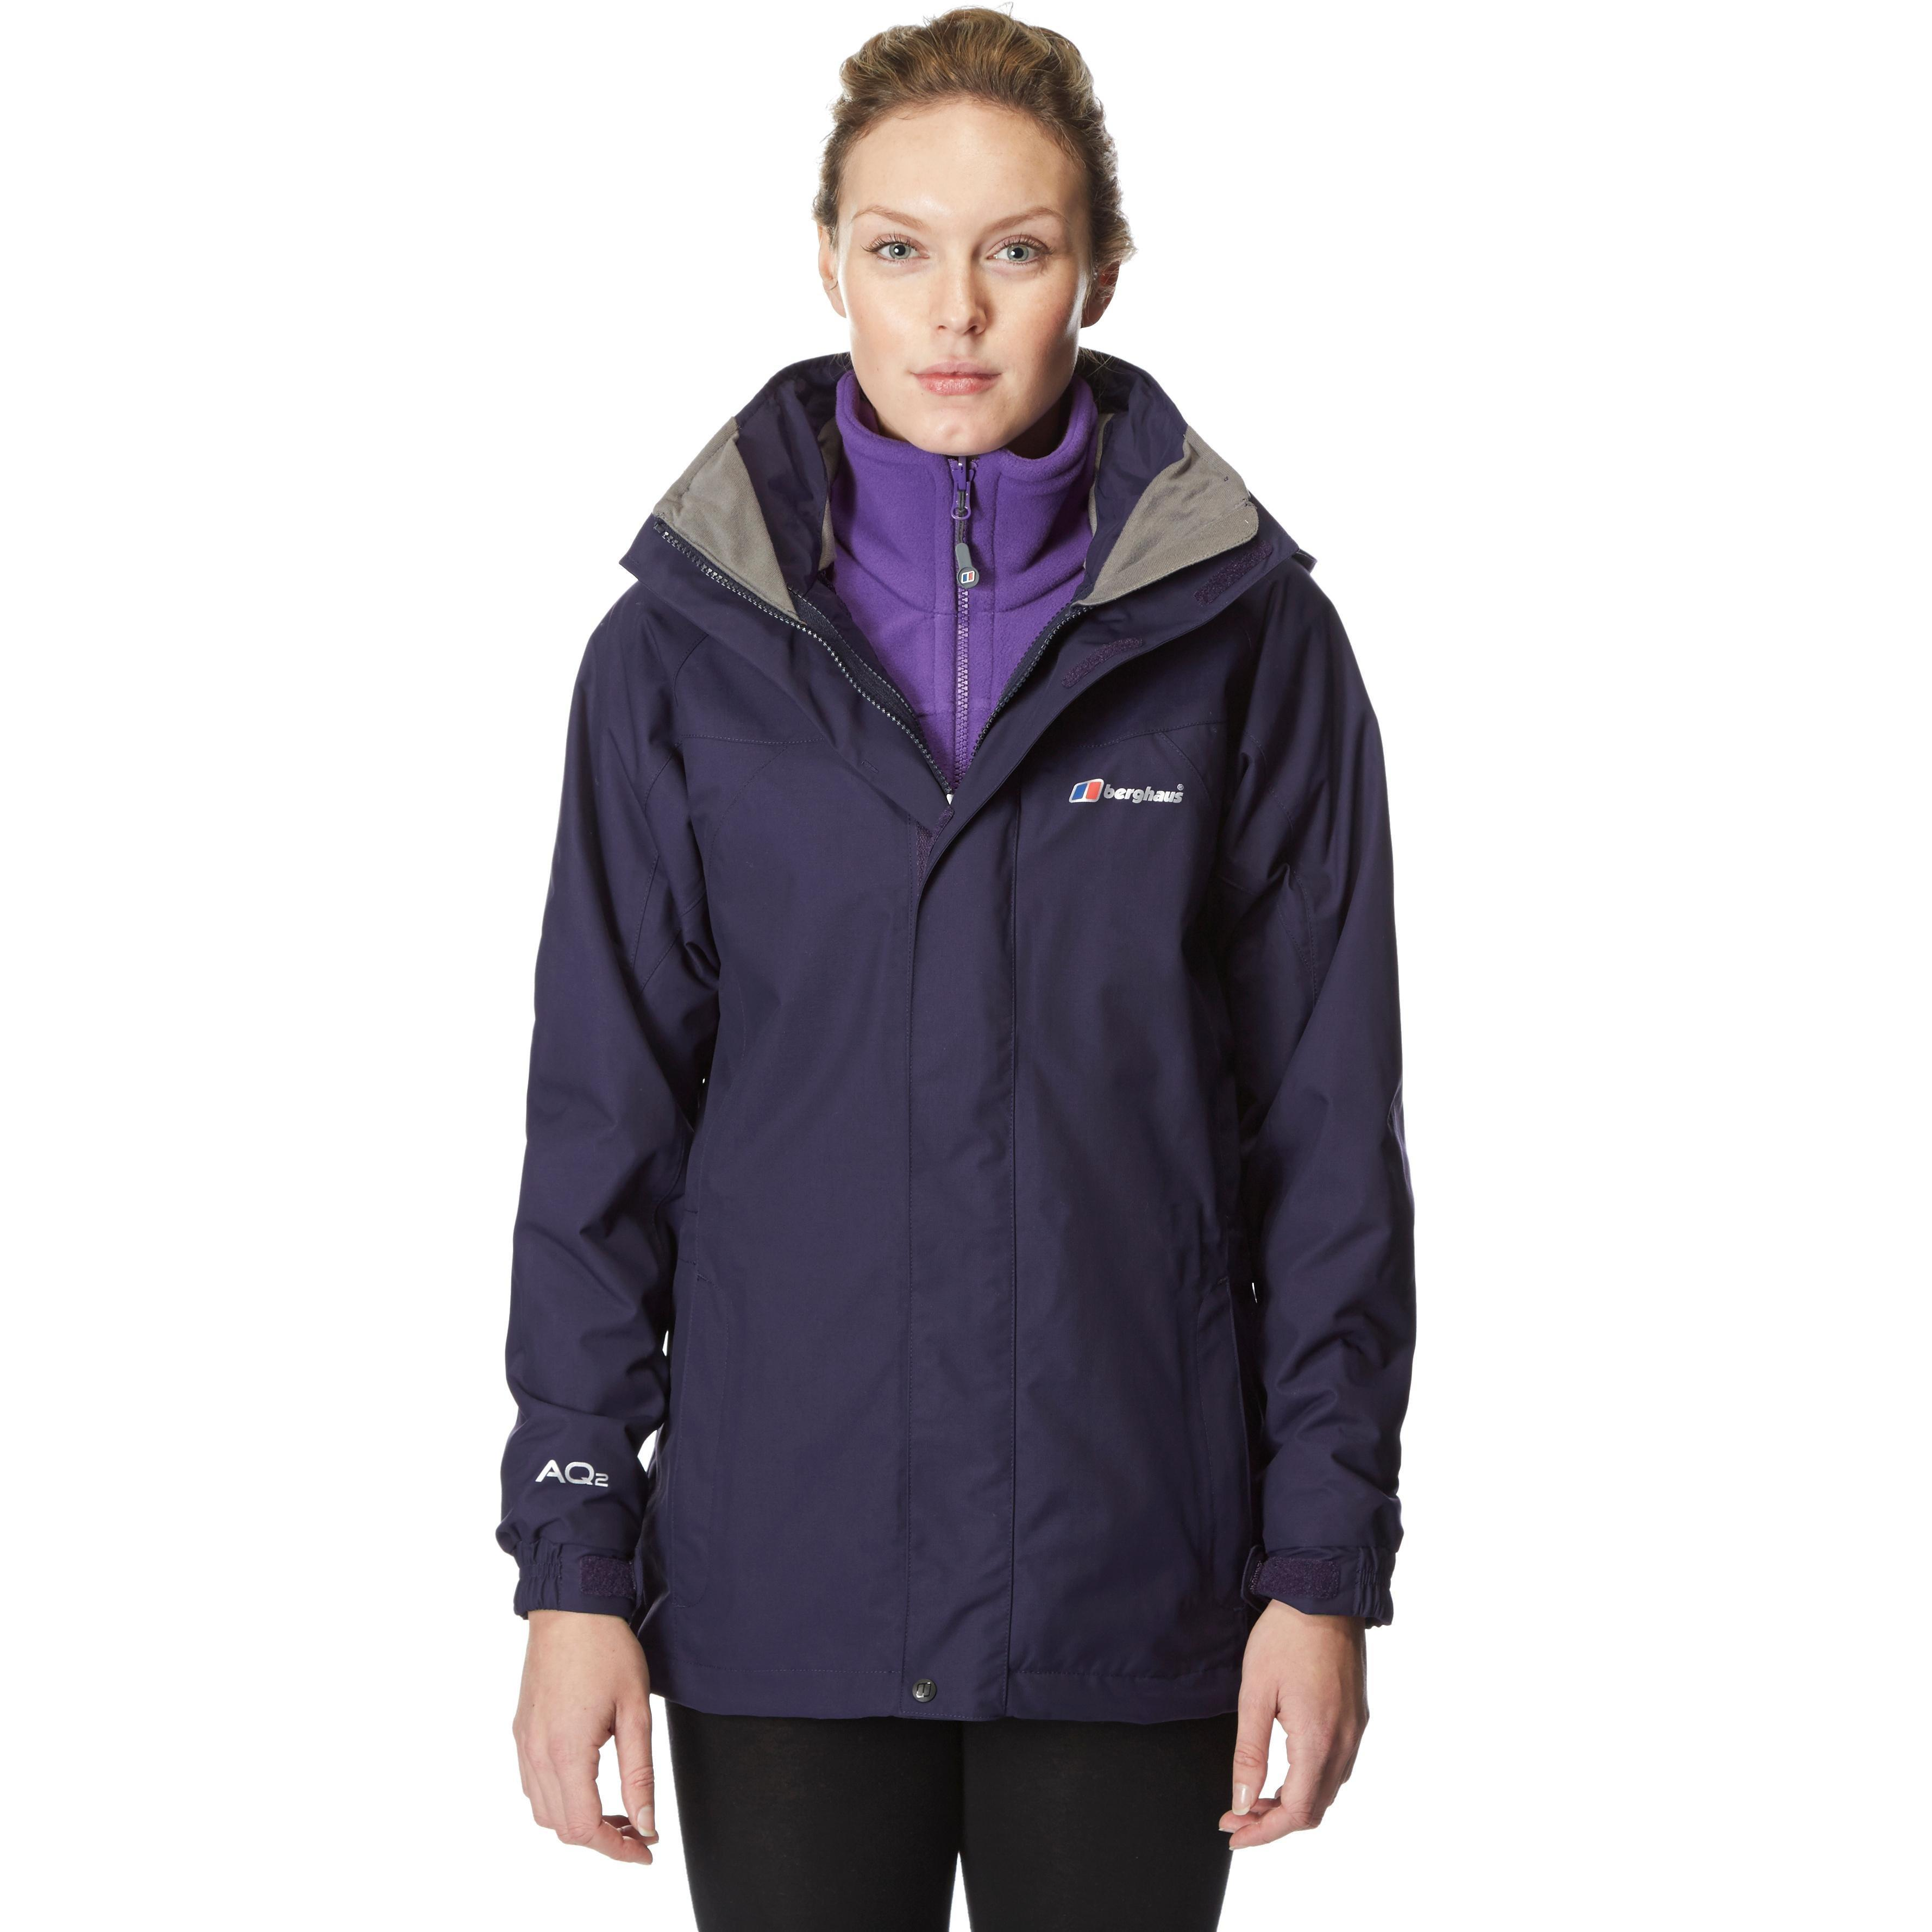 Berghaus Womens Causeway 3 in 1 AQ2 Jacket Purple